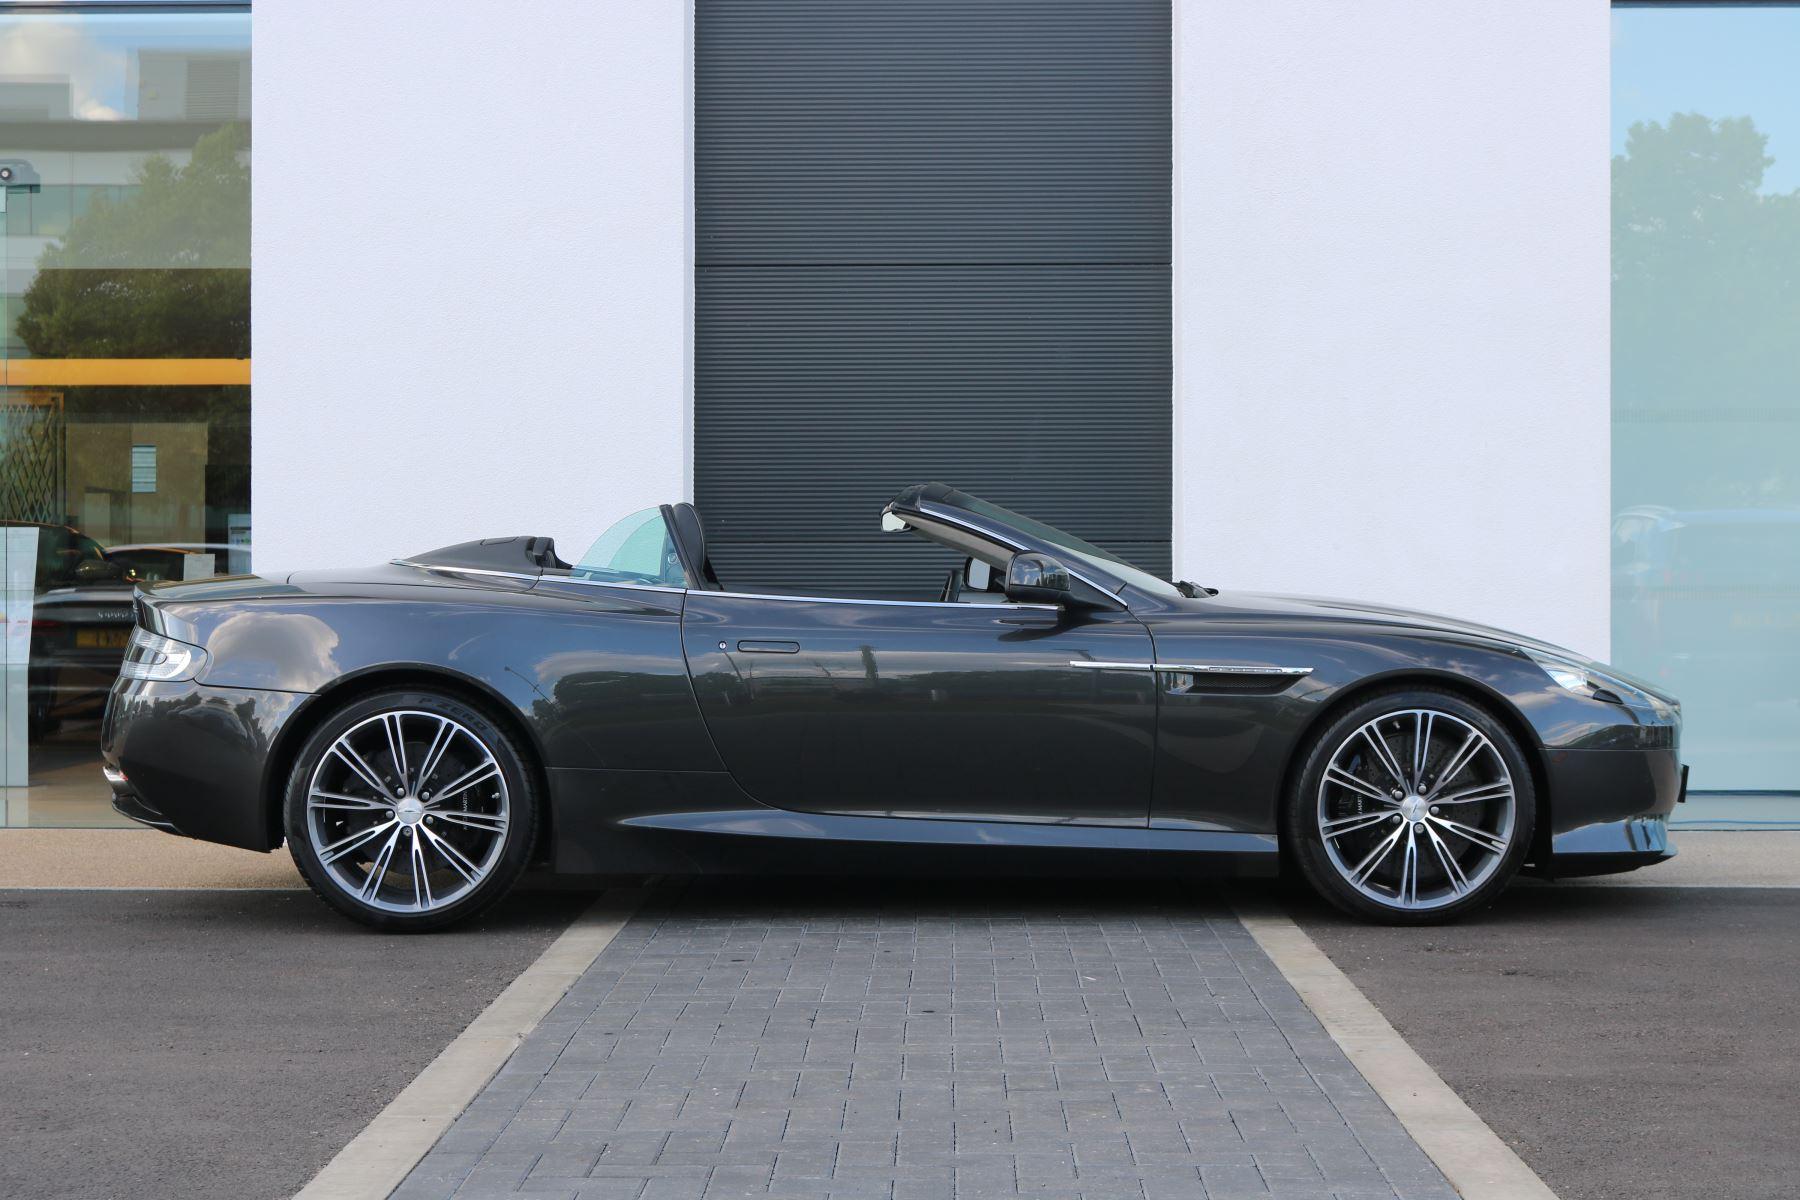 Aston Martin Virage V12 2dr Volante Touchtronic image 7